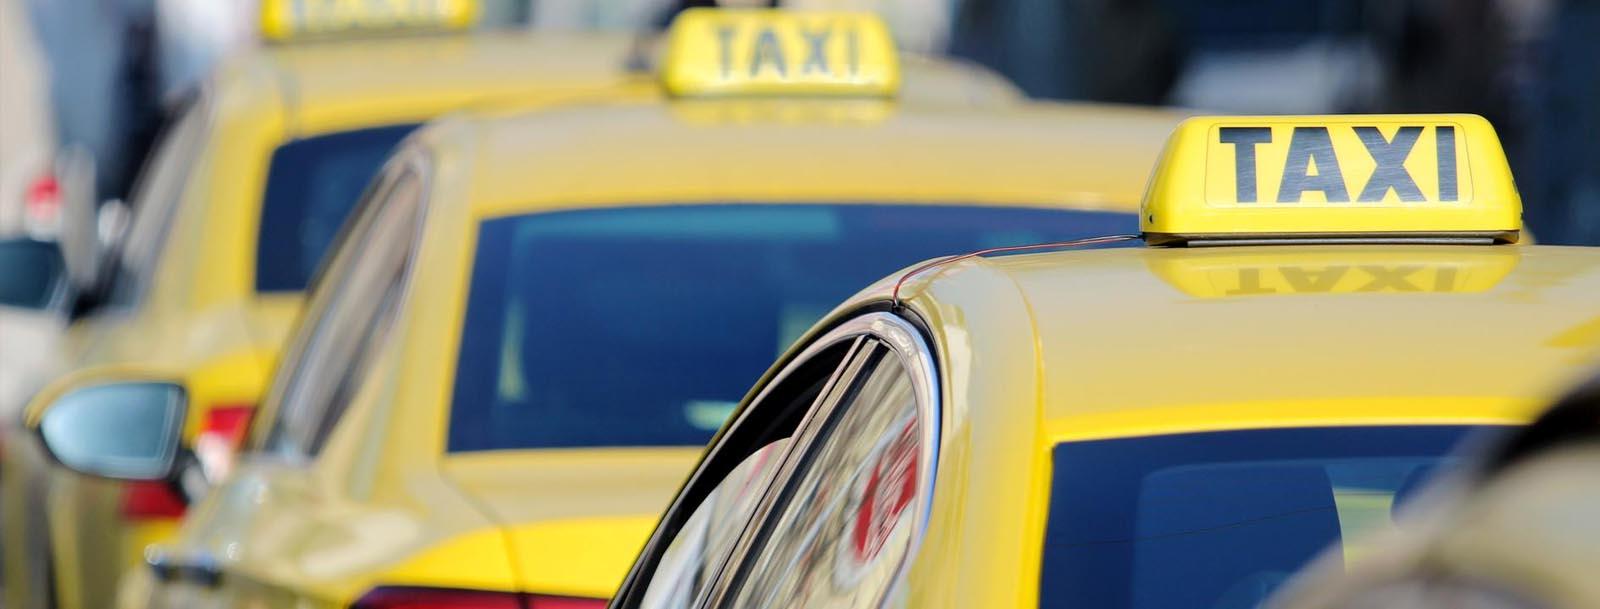 Motoristas de Taxi